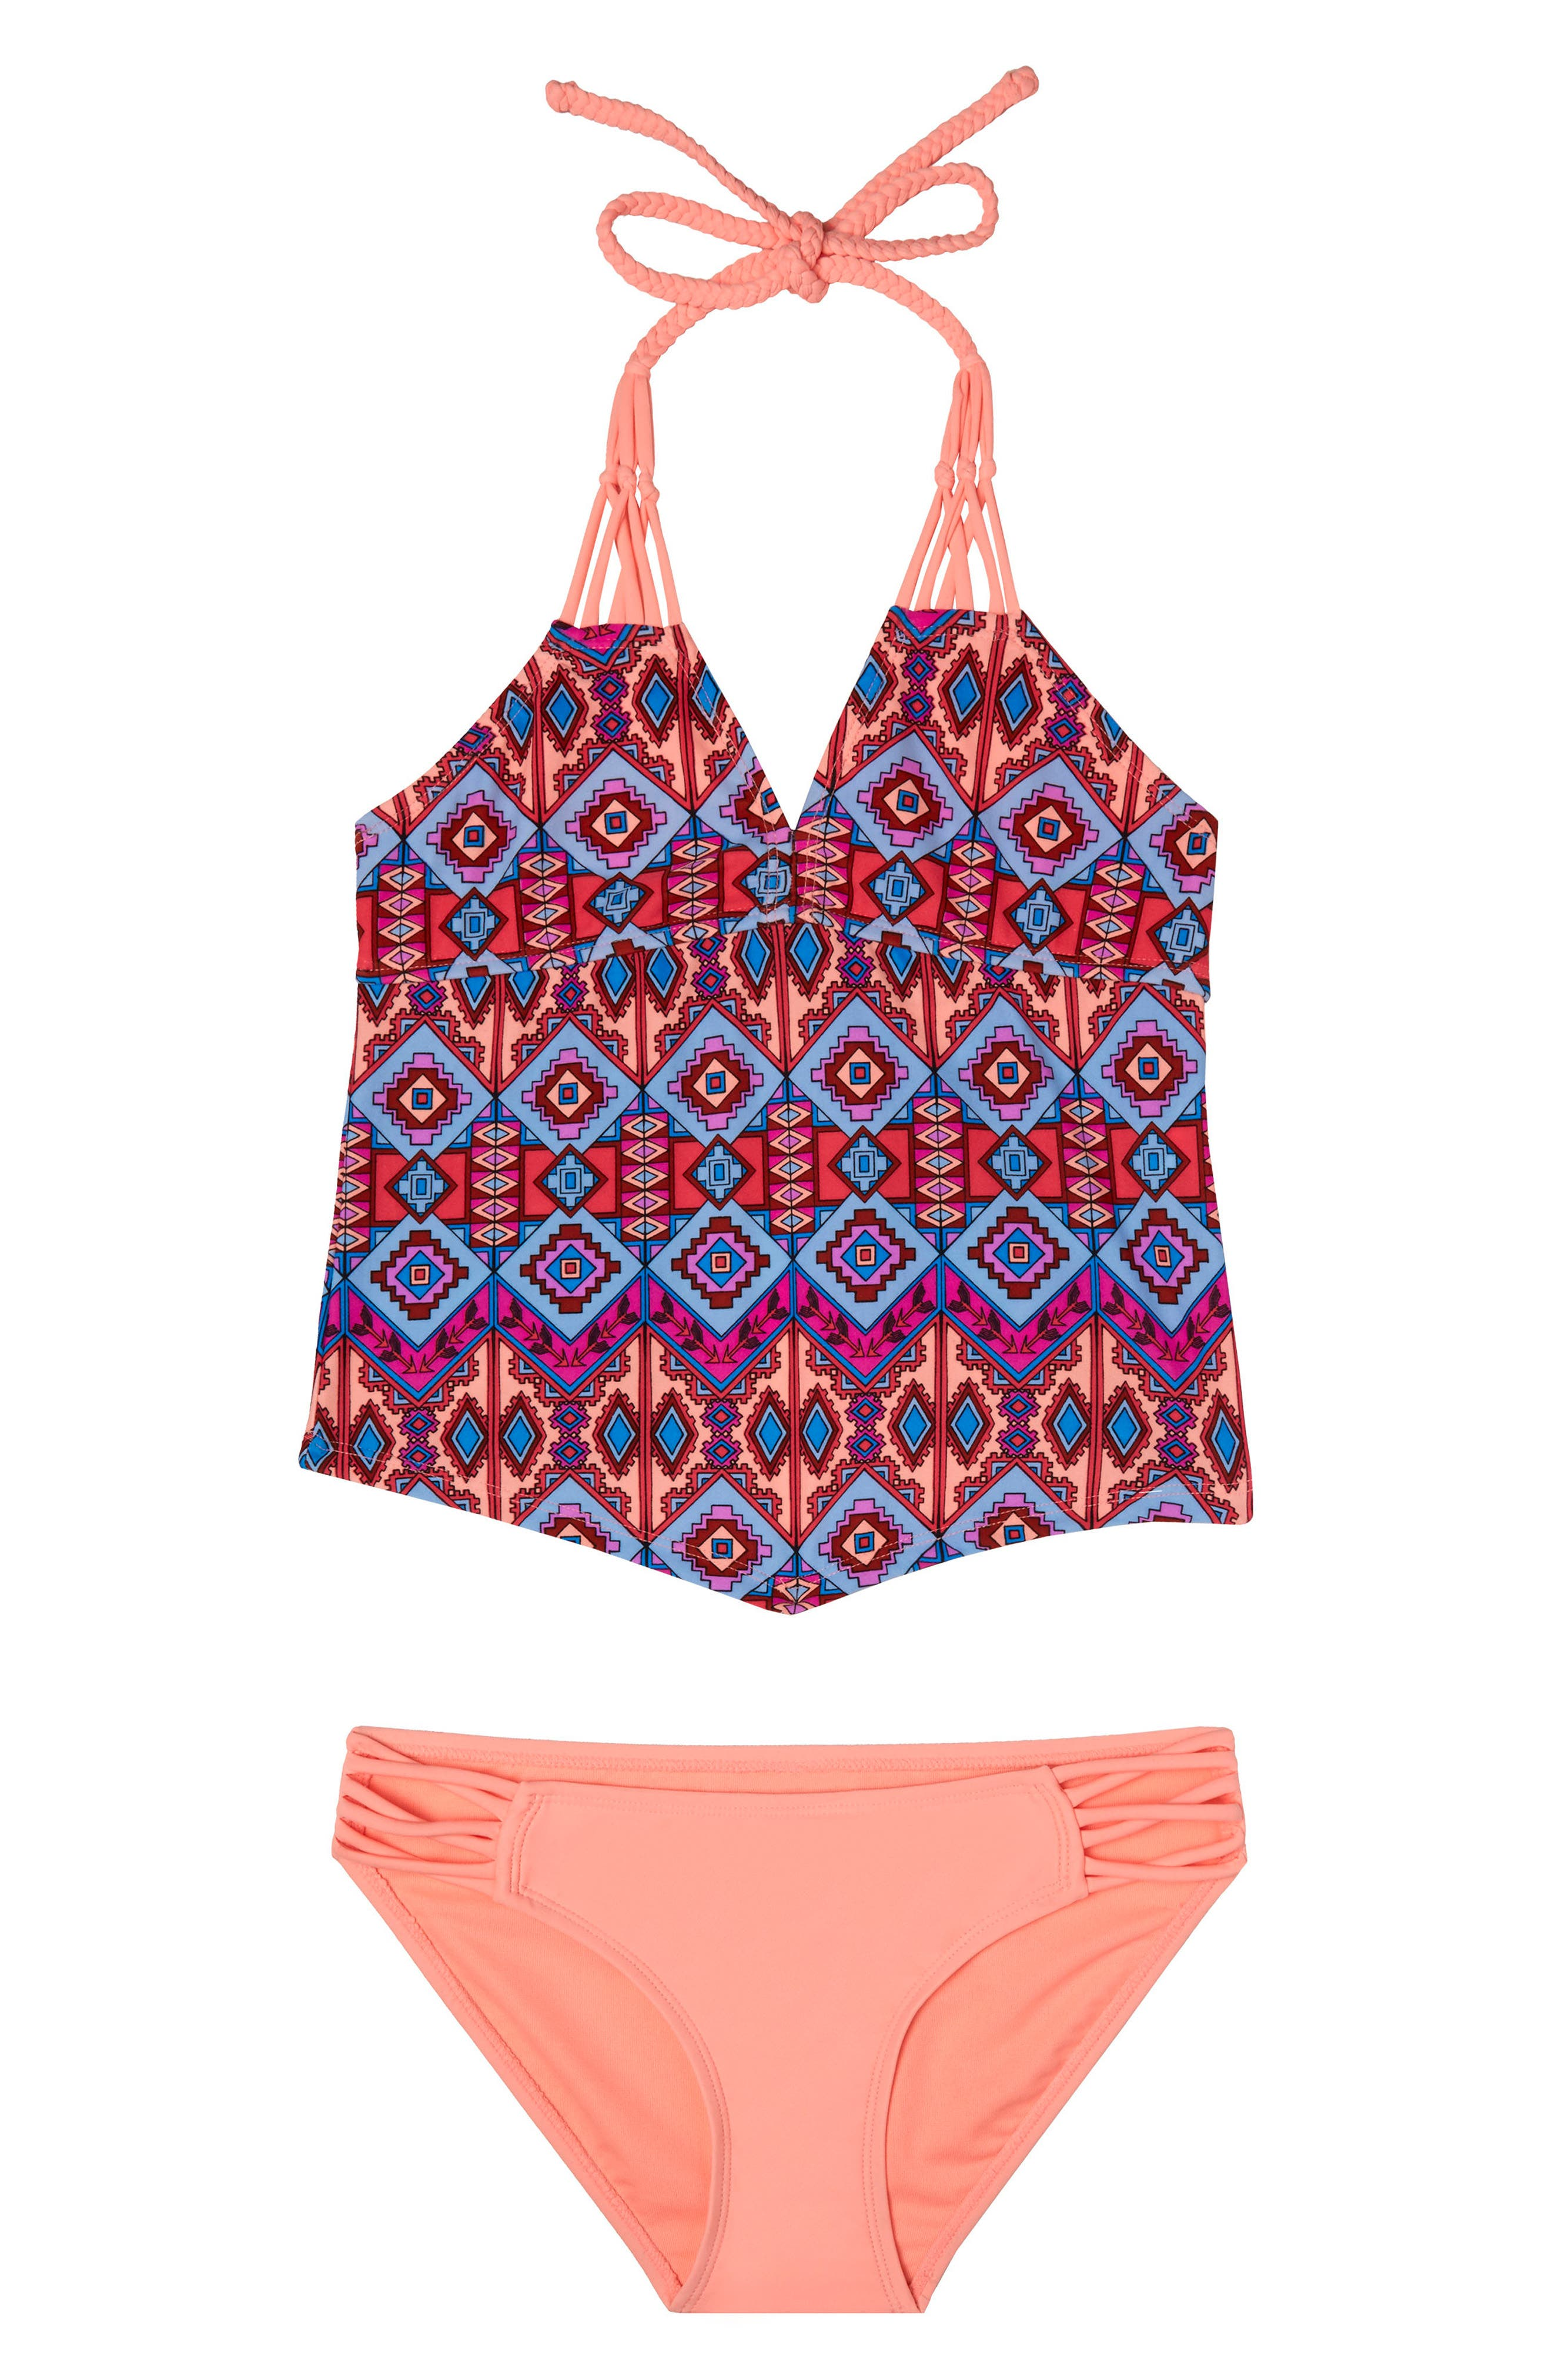 Brave Spirit Two-Piece Swimsuit,                         Main,                         color, Coral